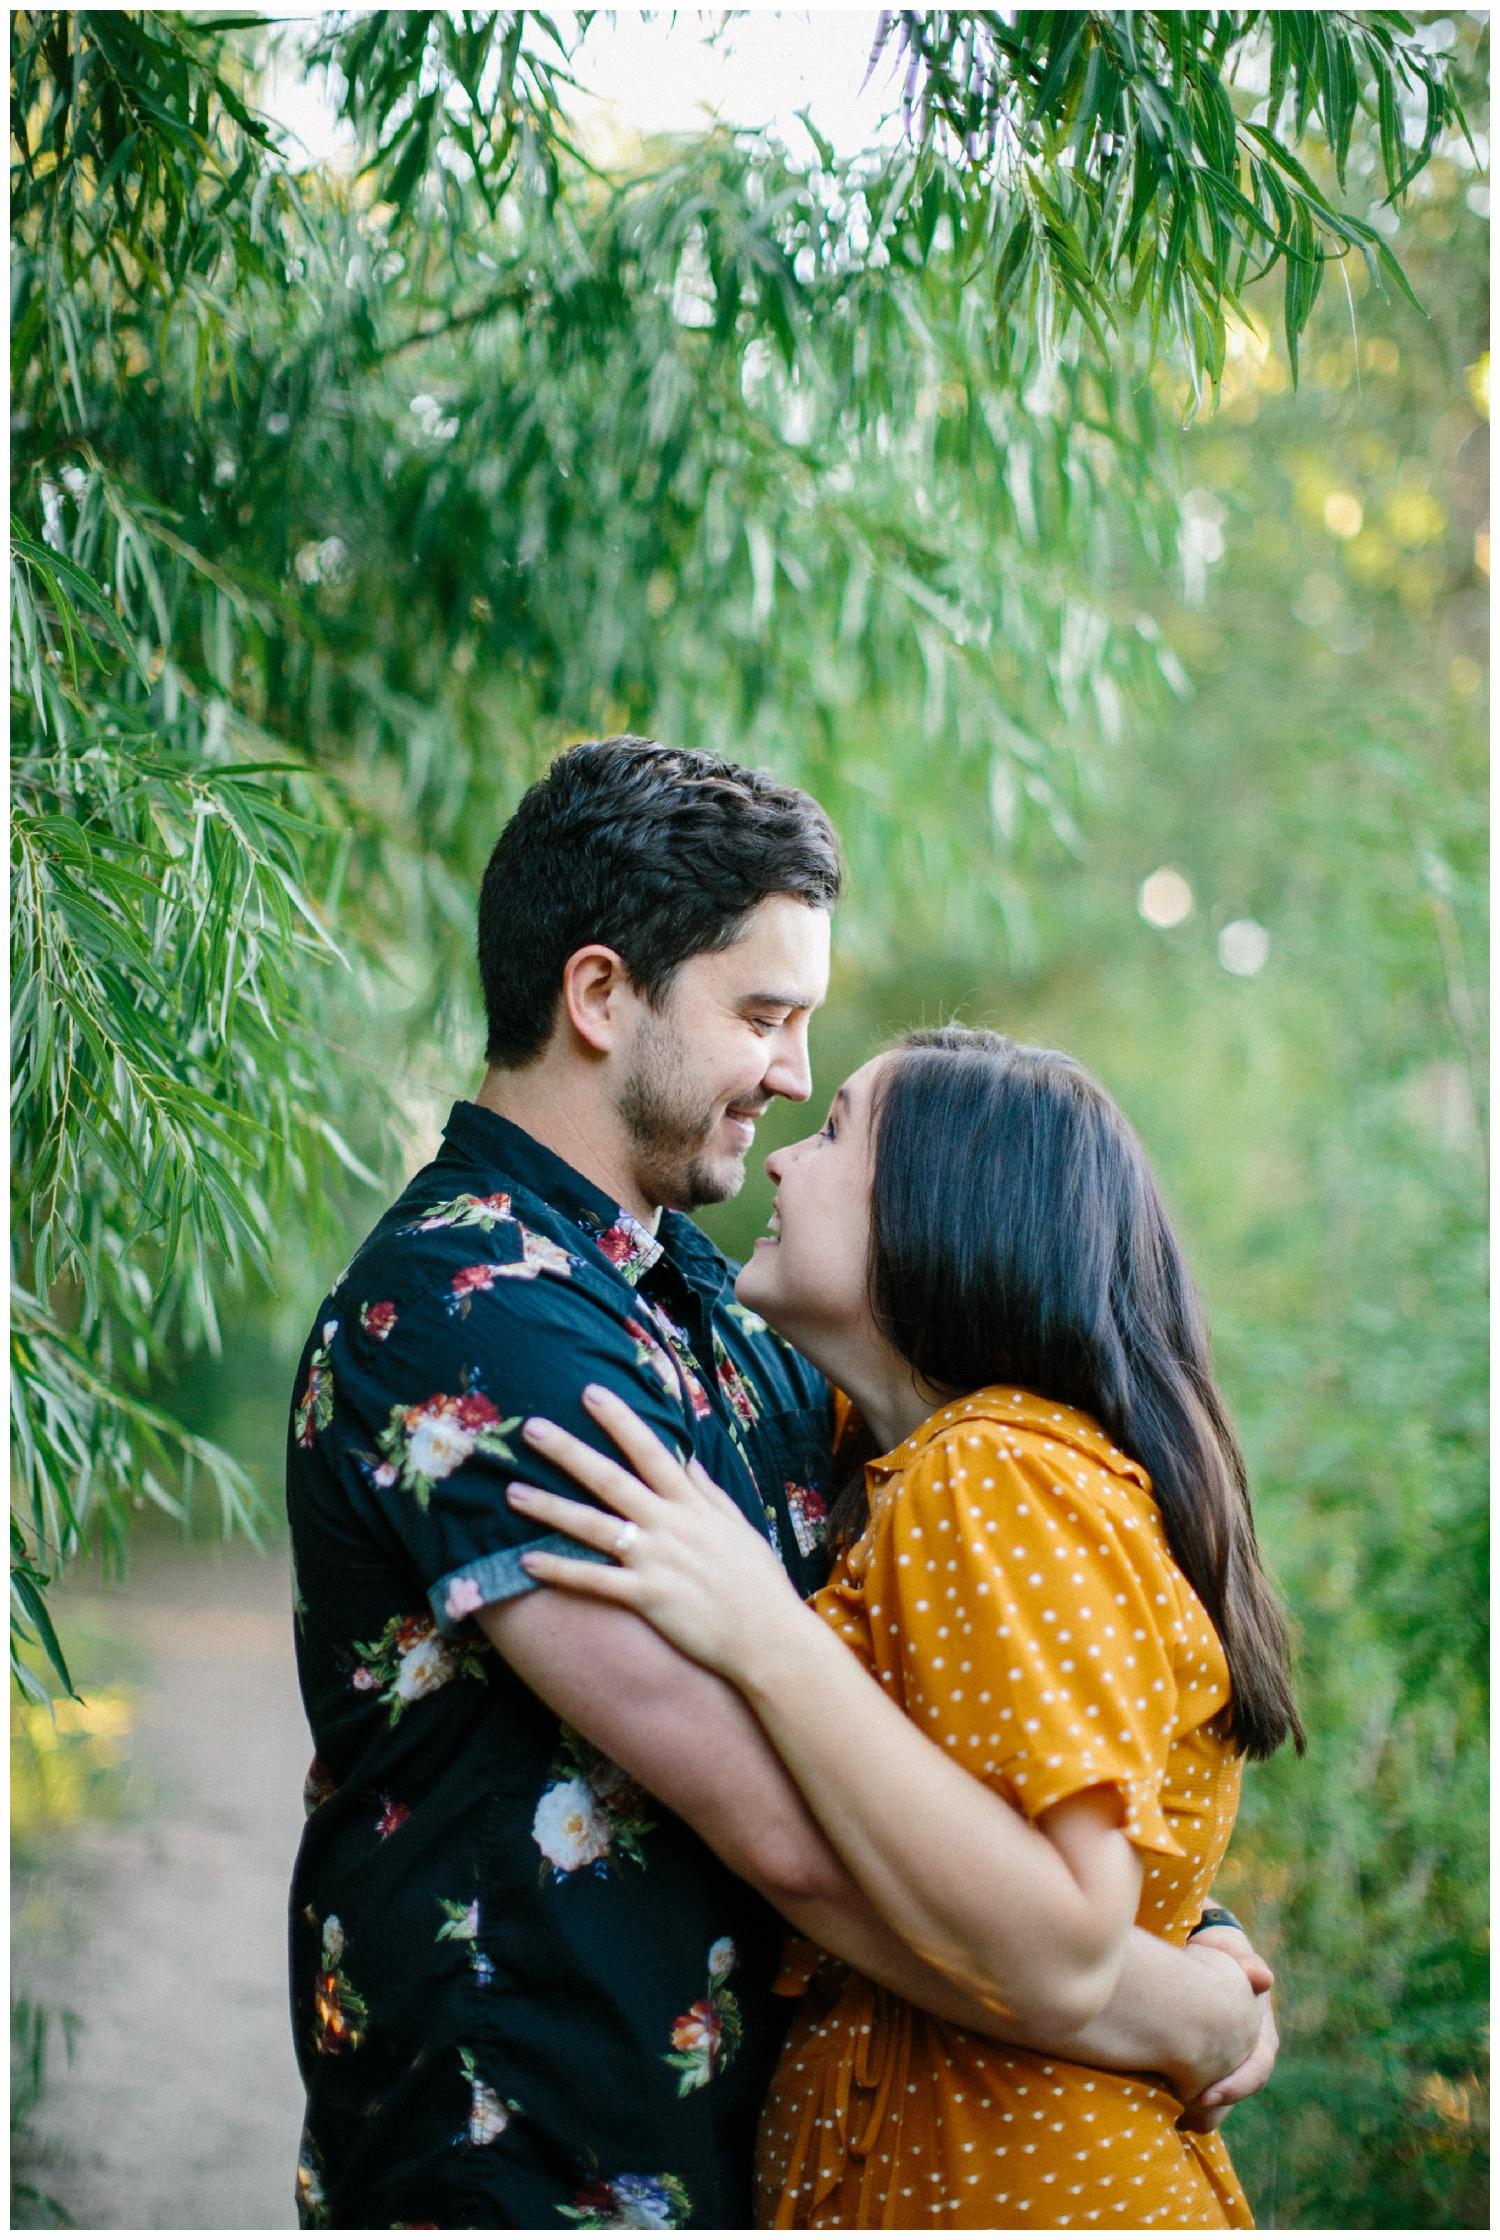 texas proposal engagement photoshoot_018.jpg